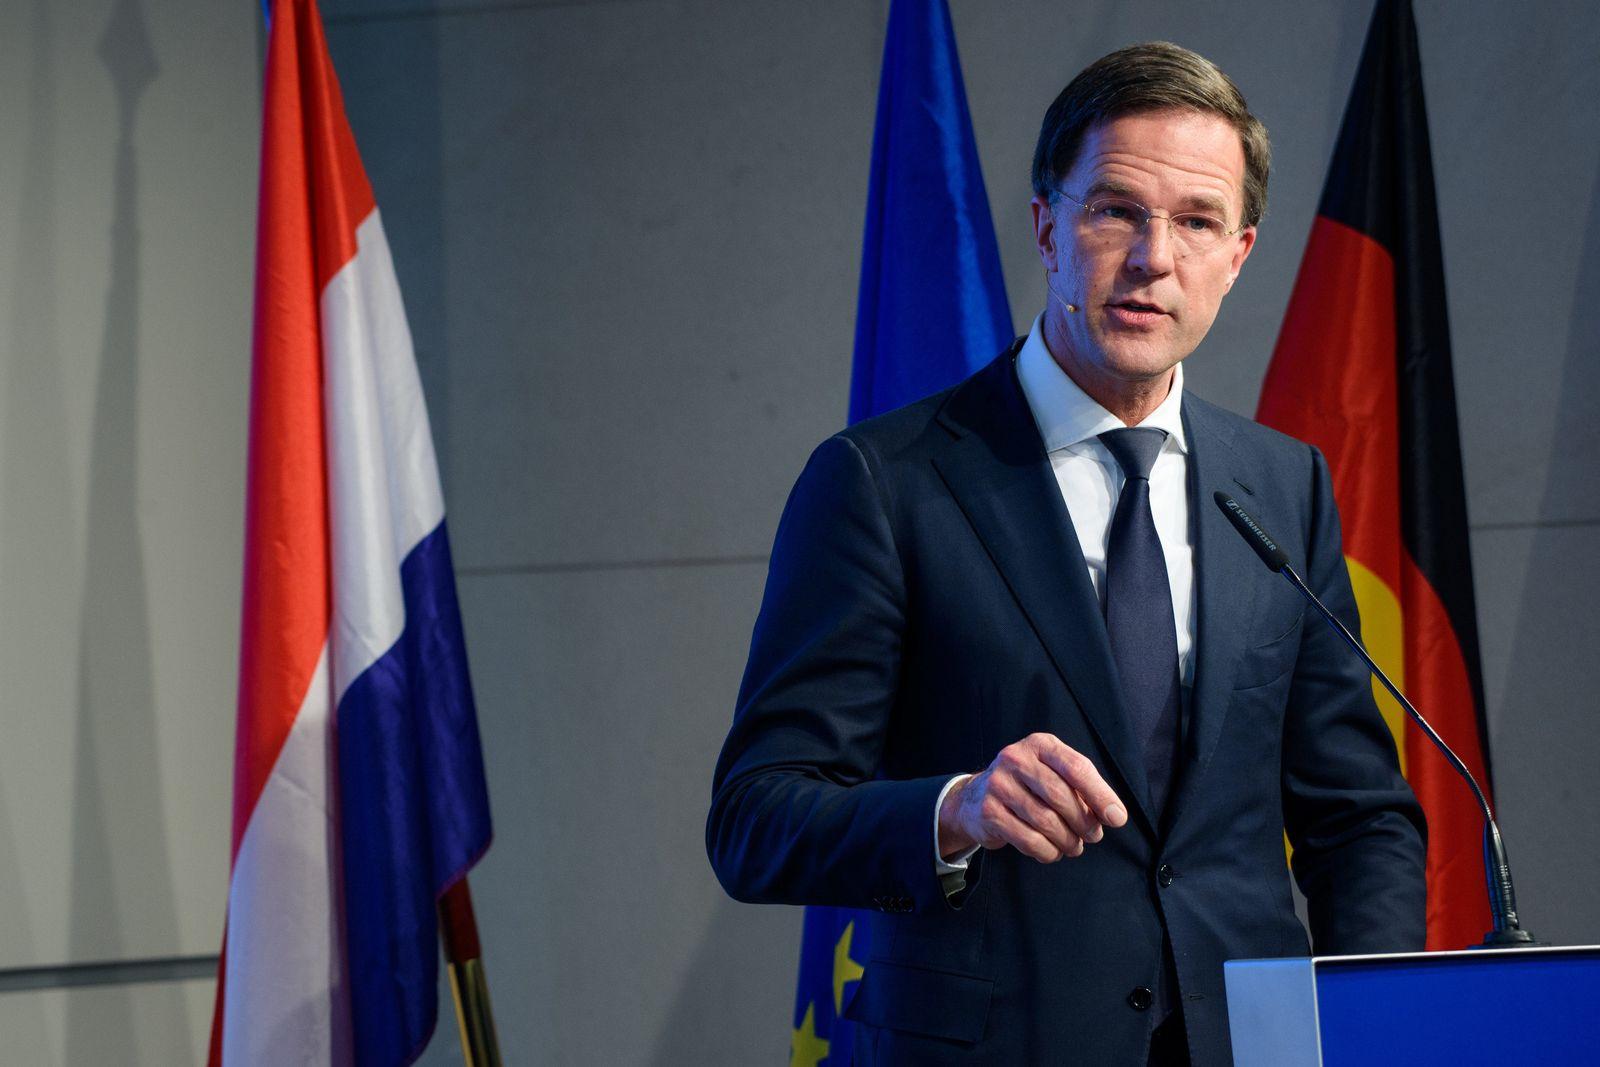 Mark Rutte/ Europa/ Niederlande